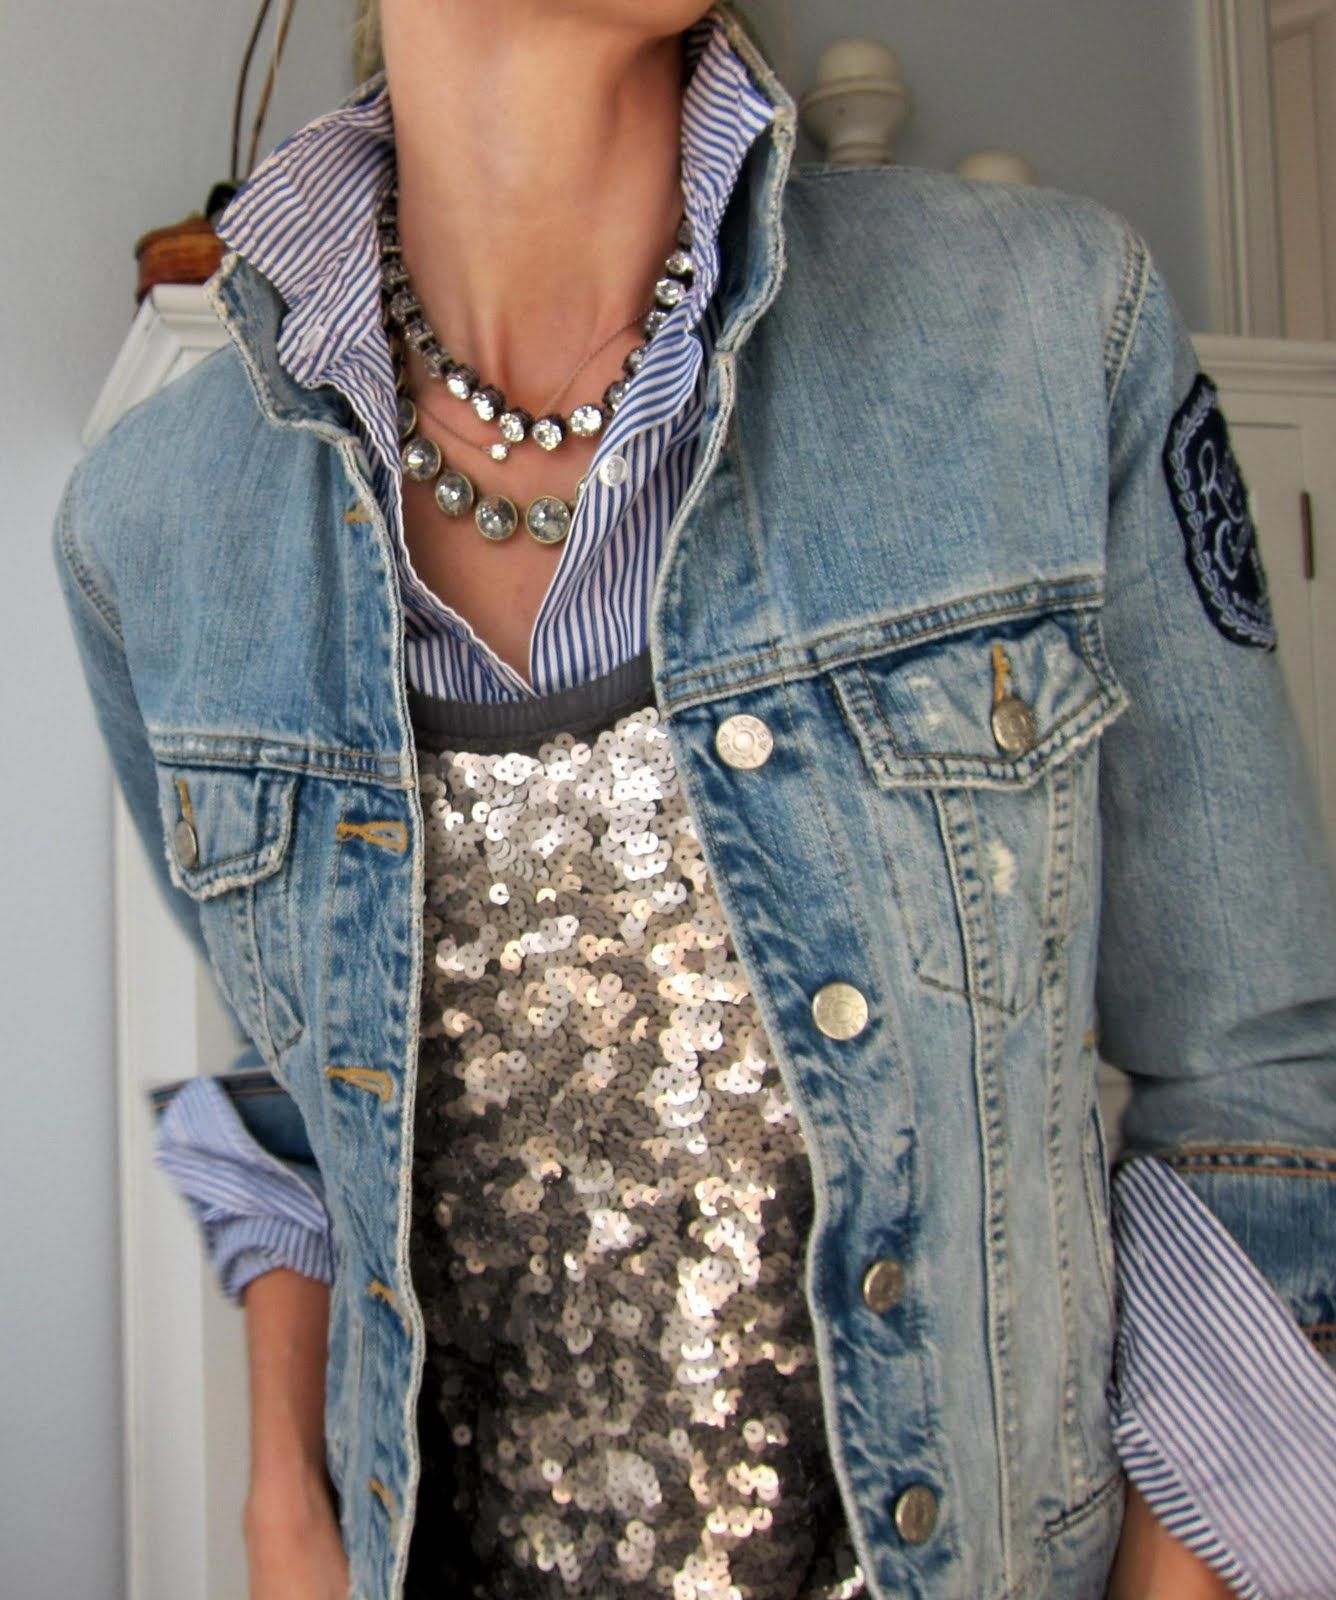 fashion dork: ADDICTED TO CRYSTAL